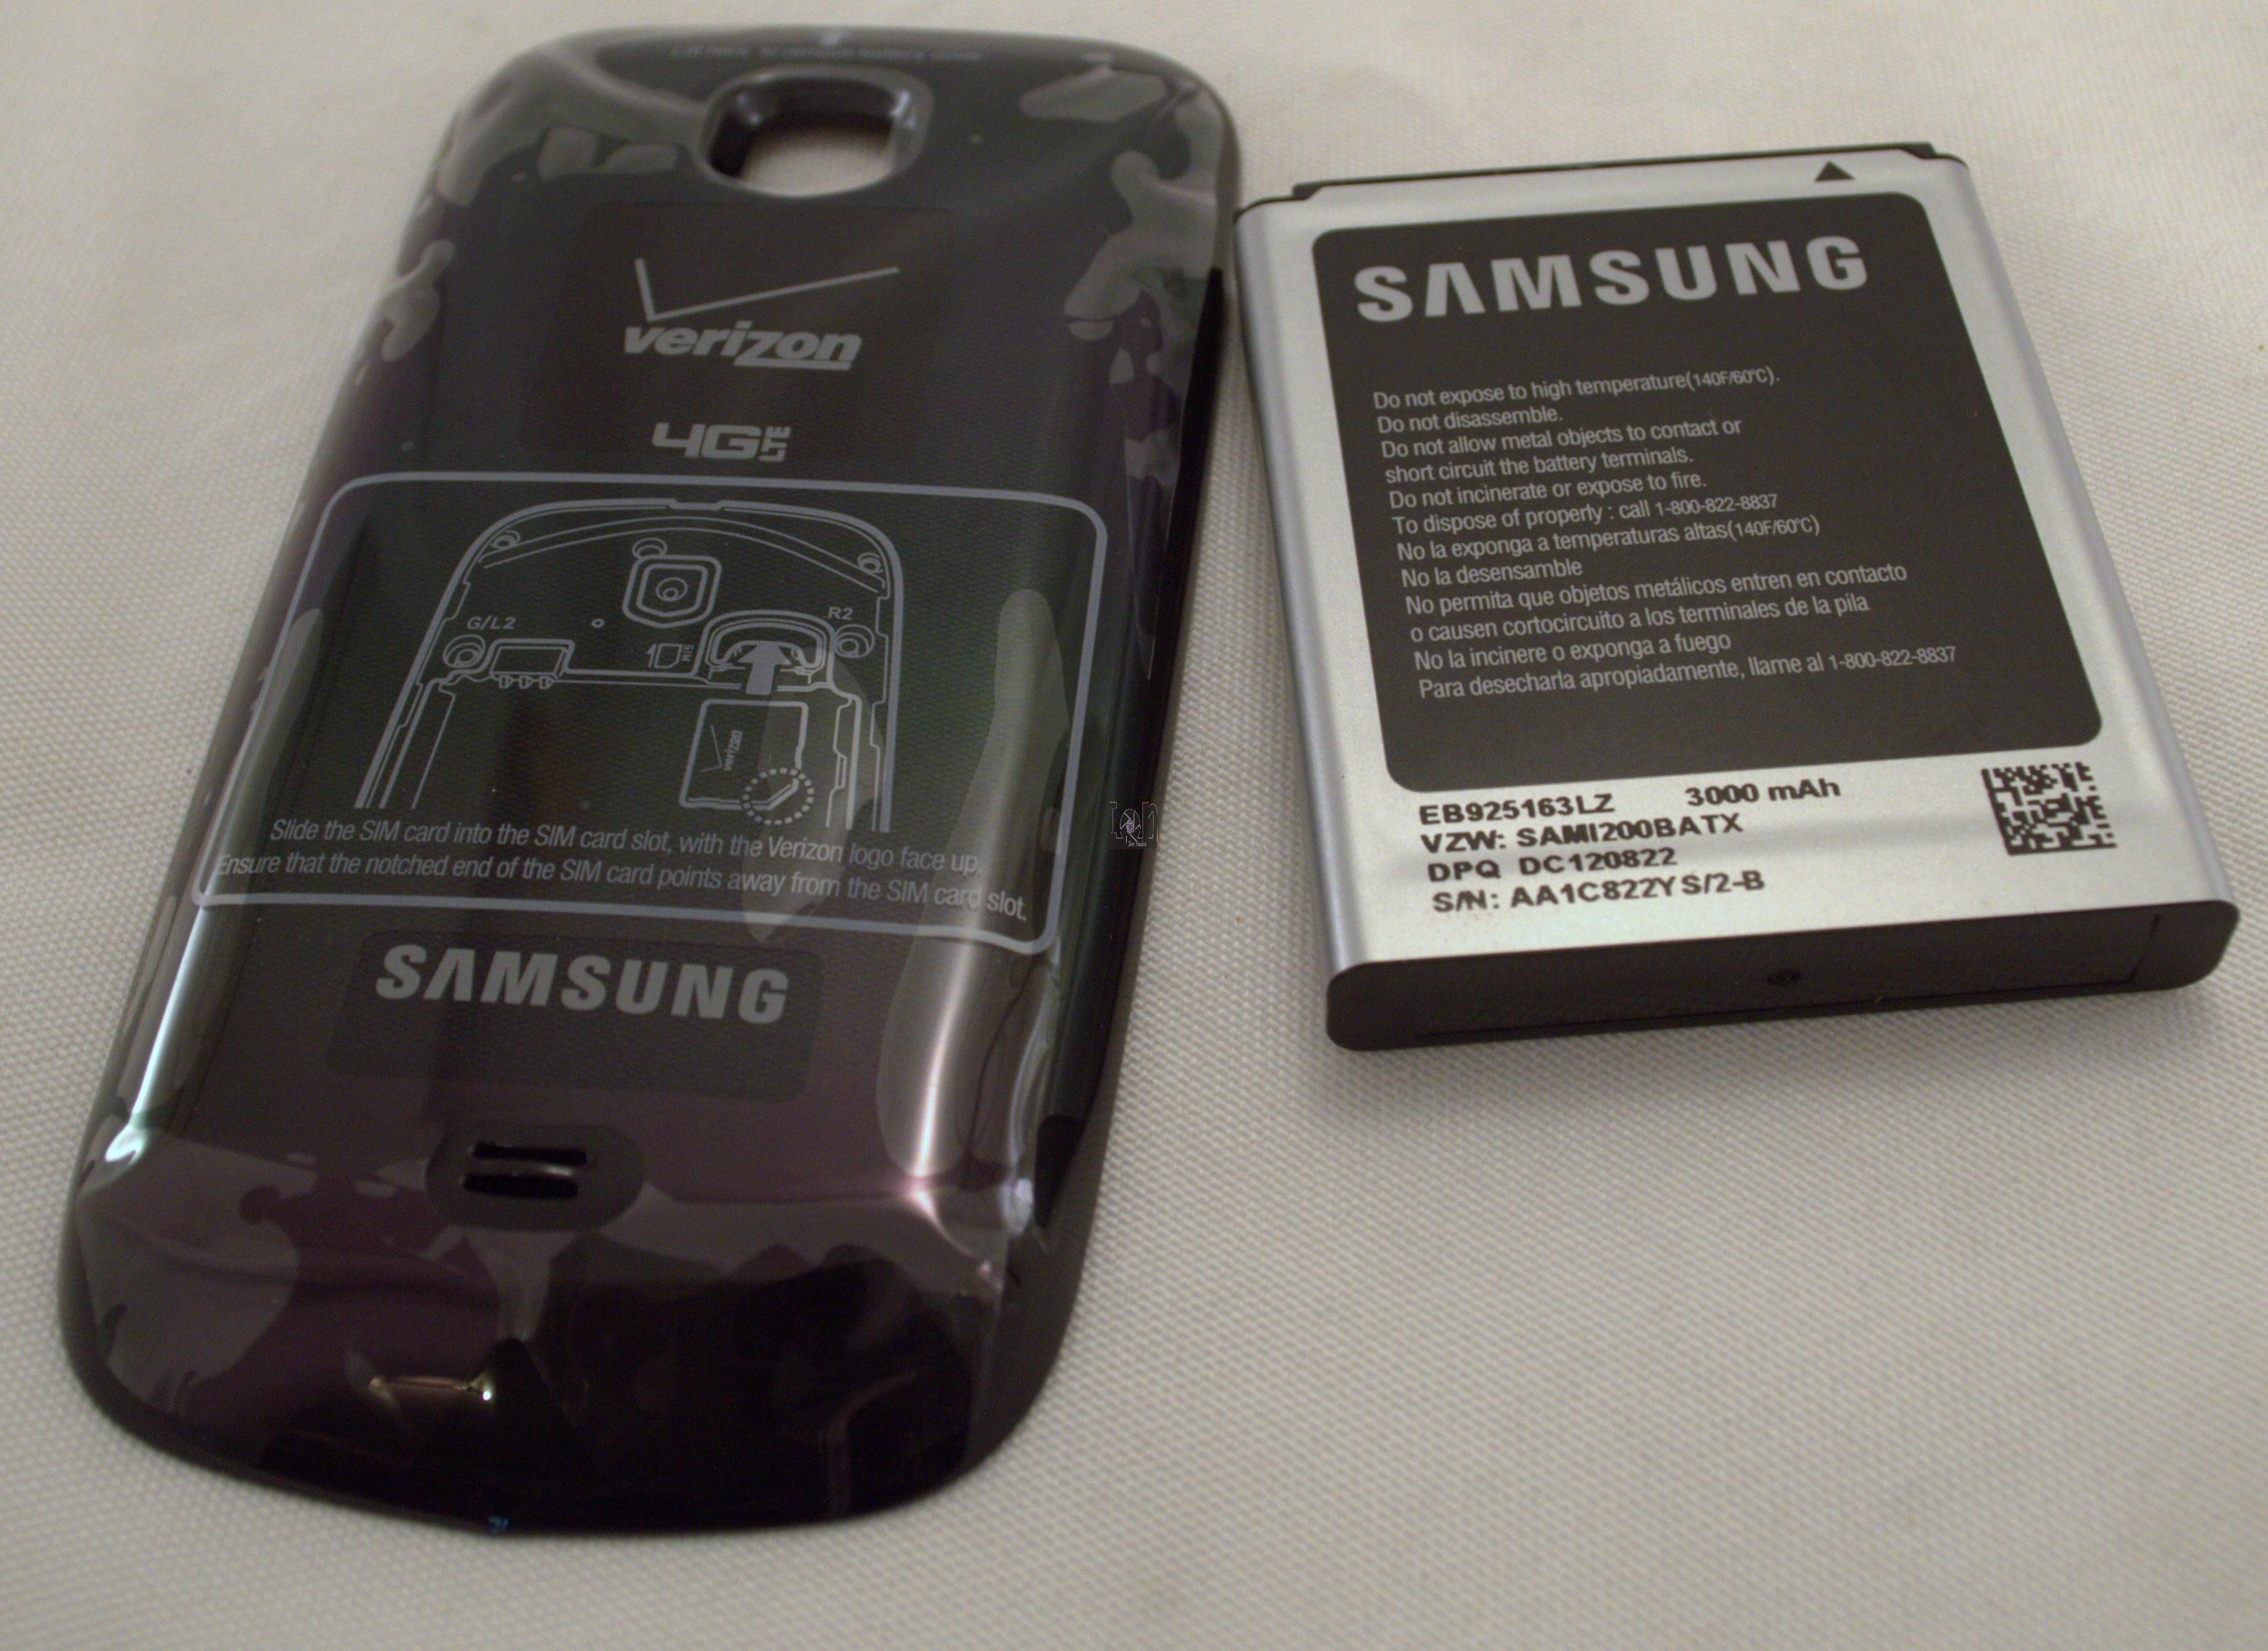 NEW OEM Samsung EB925163LZ Galaxy Steller Extended Battery 3000mAh